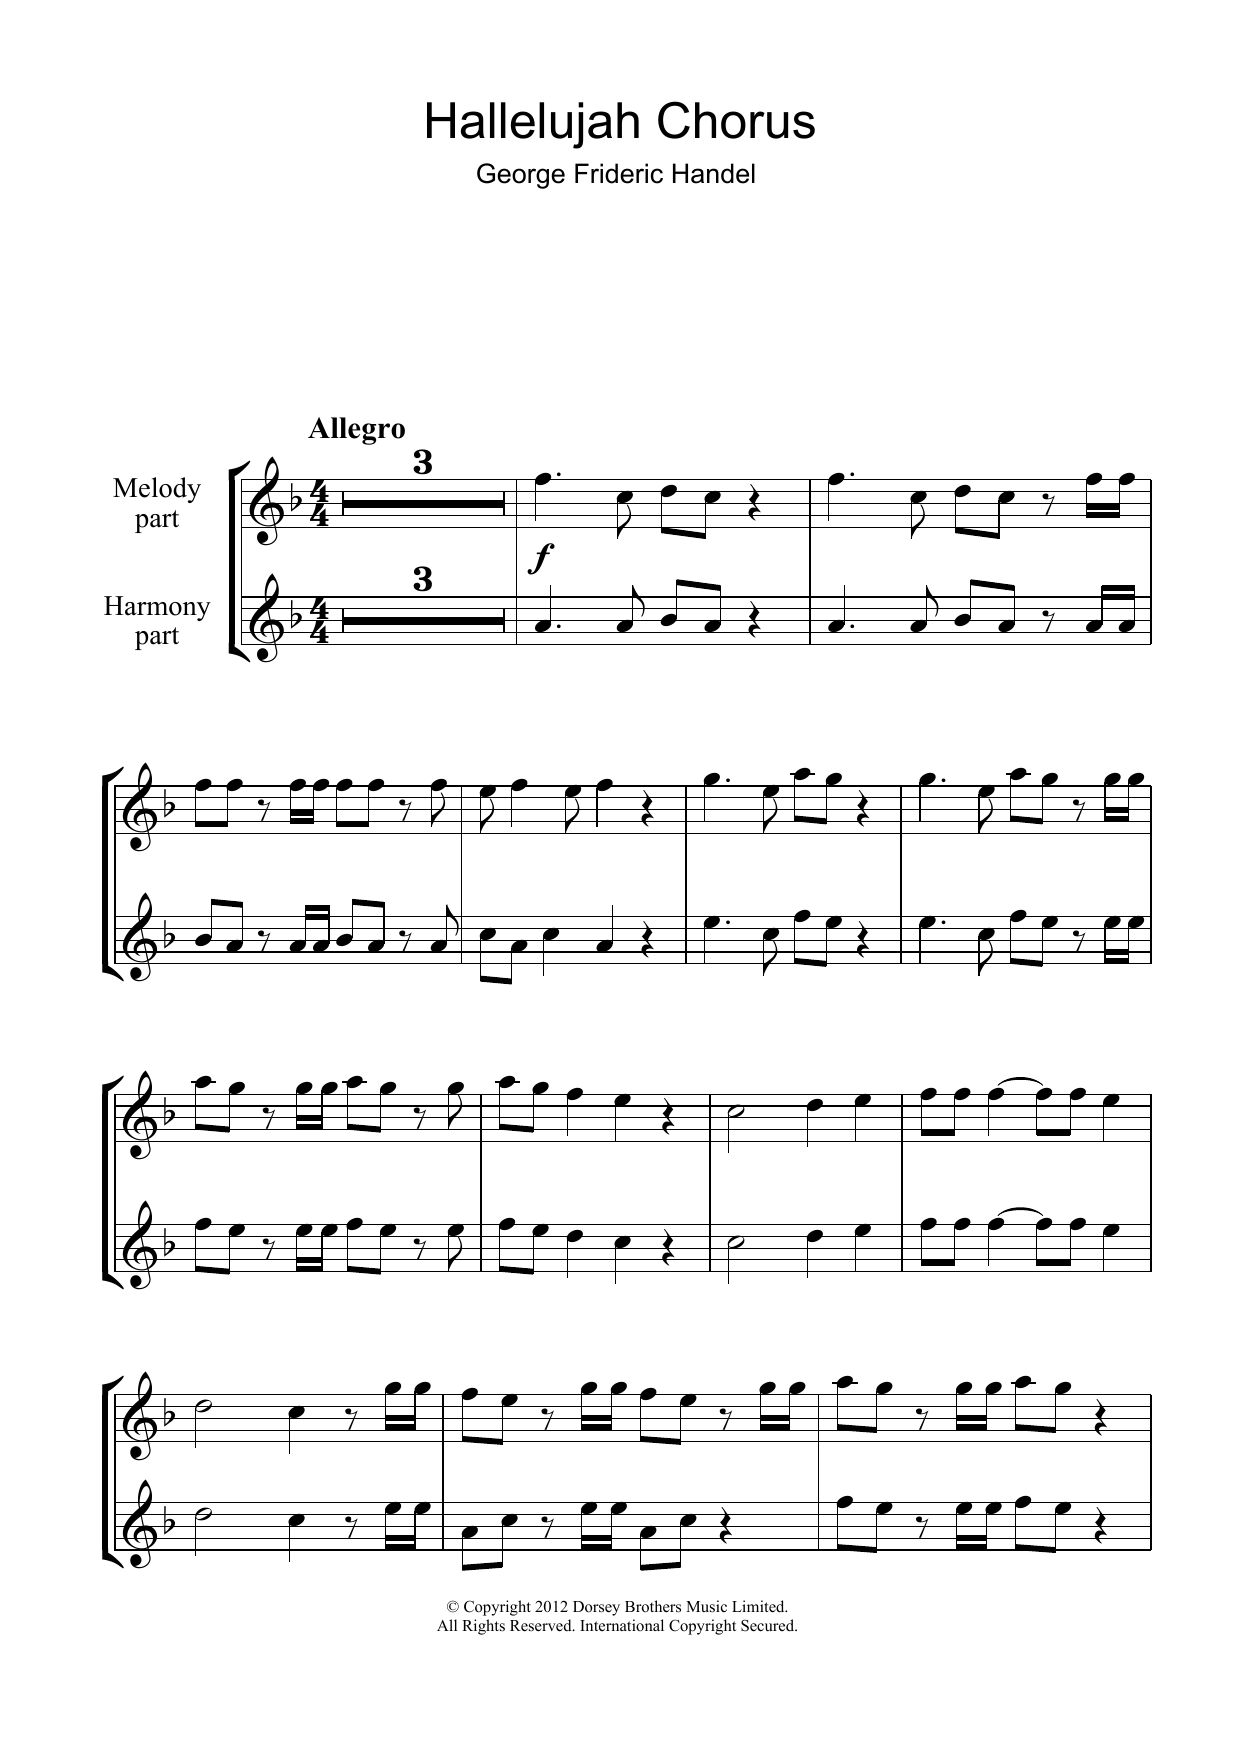 Christmas Hallelujah Sheet Music.Hallelujah Chorus From The Messiah By George Frideric Handel Lead Sheet Fake Book Digital Sheet Music